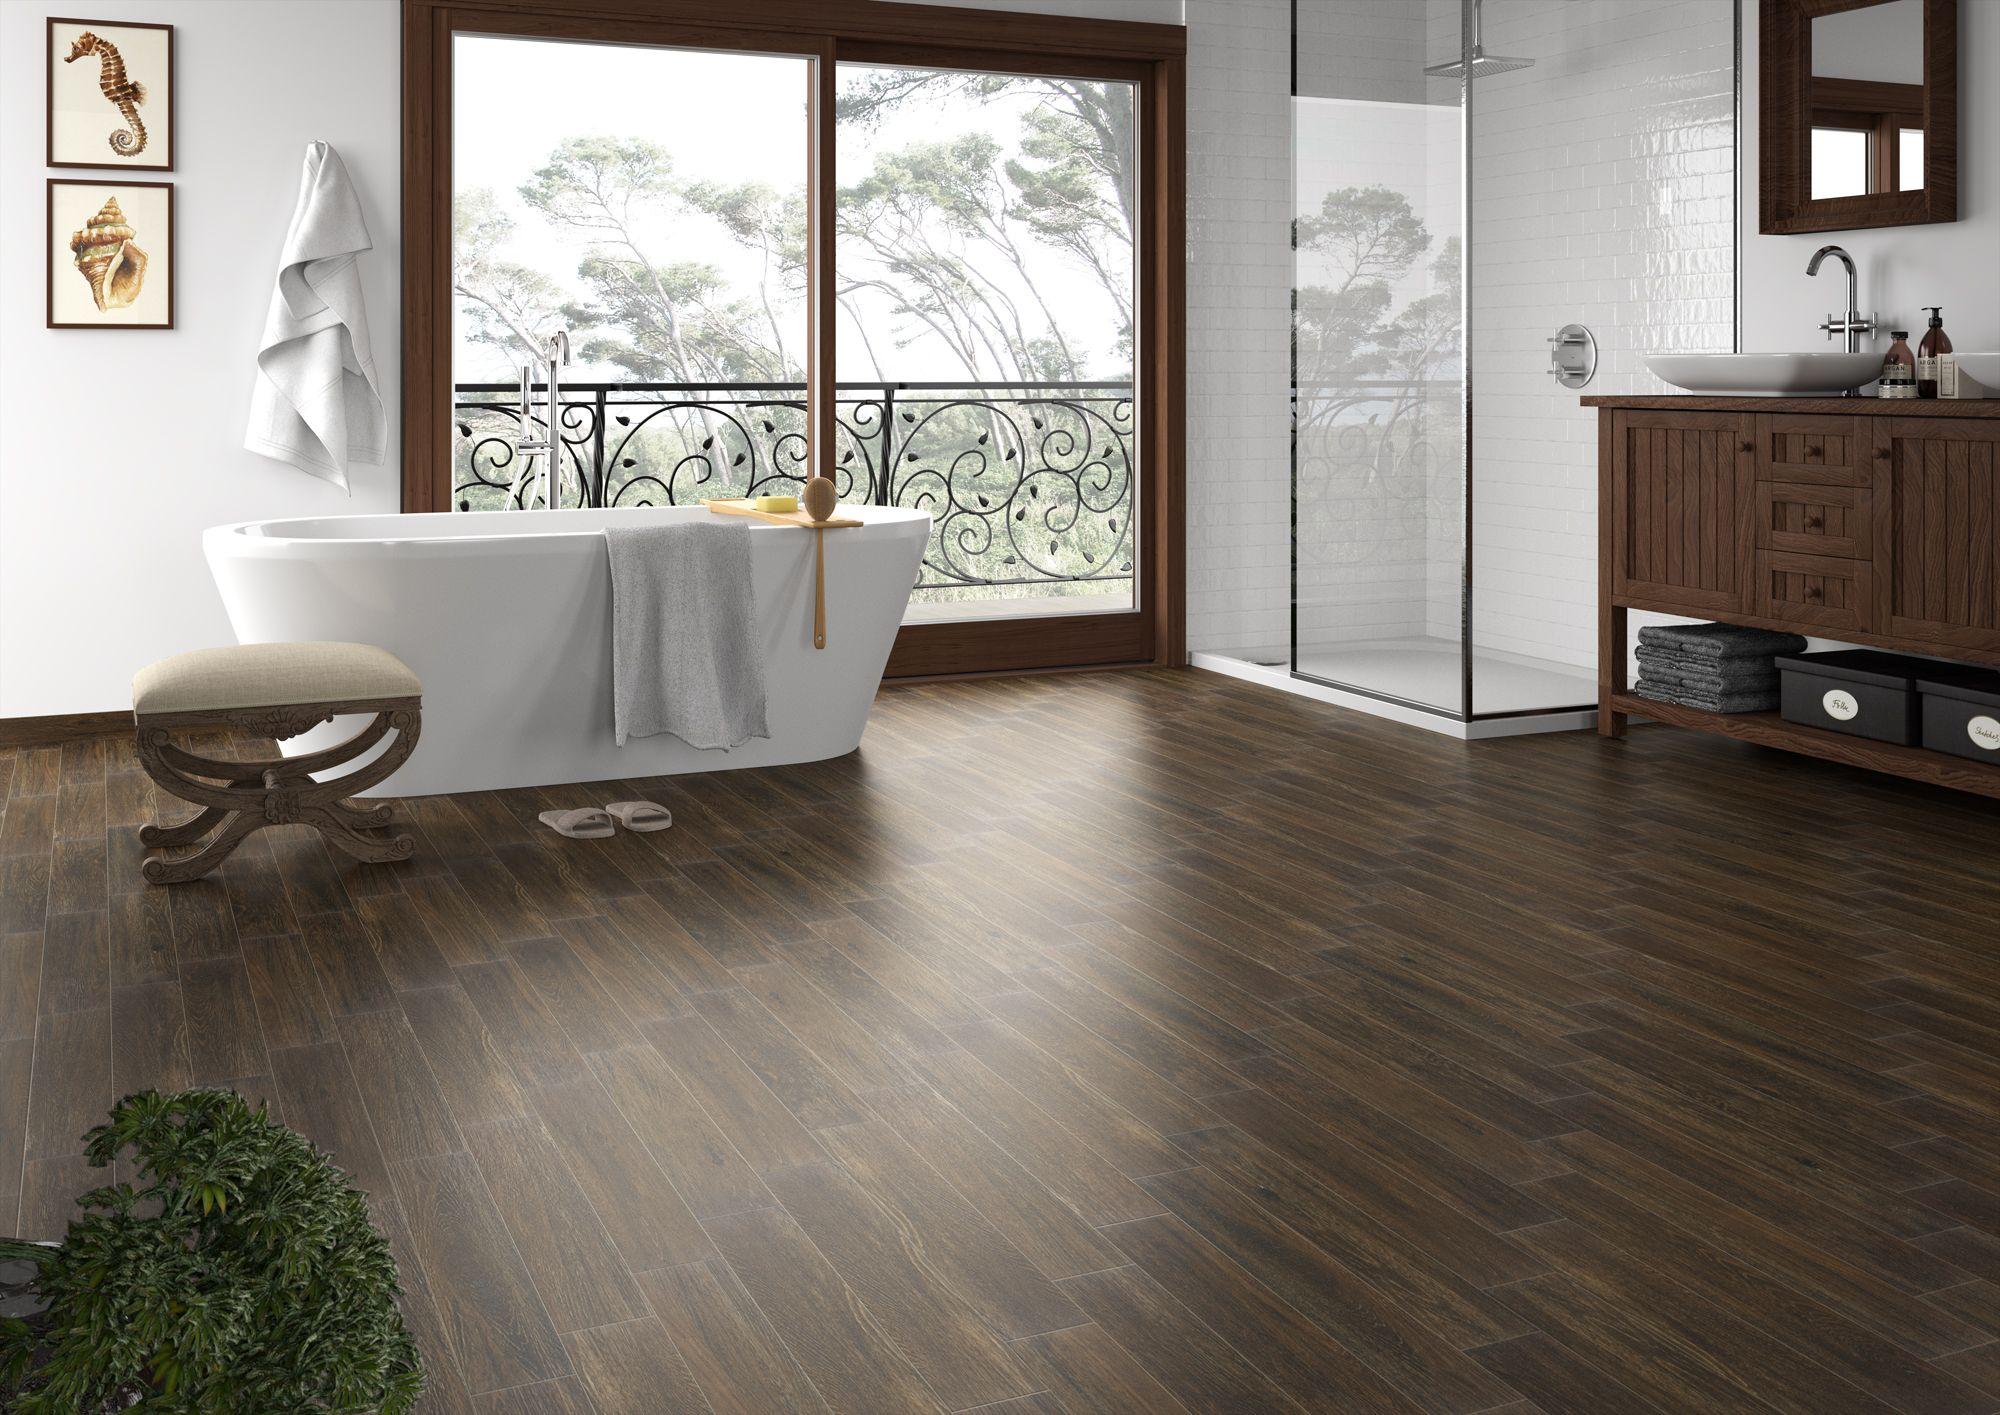 Rustic warm & inviting Autumn Oak waterproof wood look tile boasts